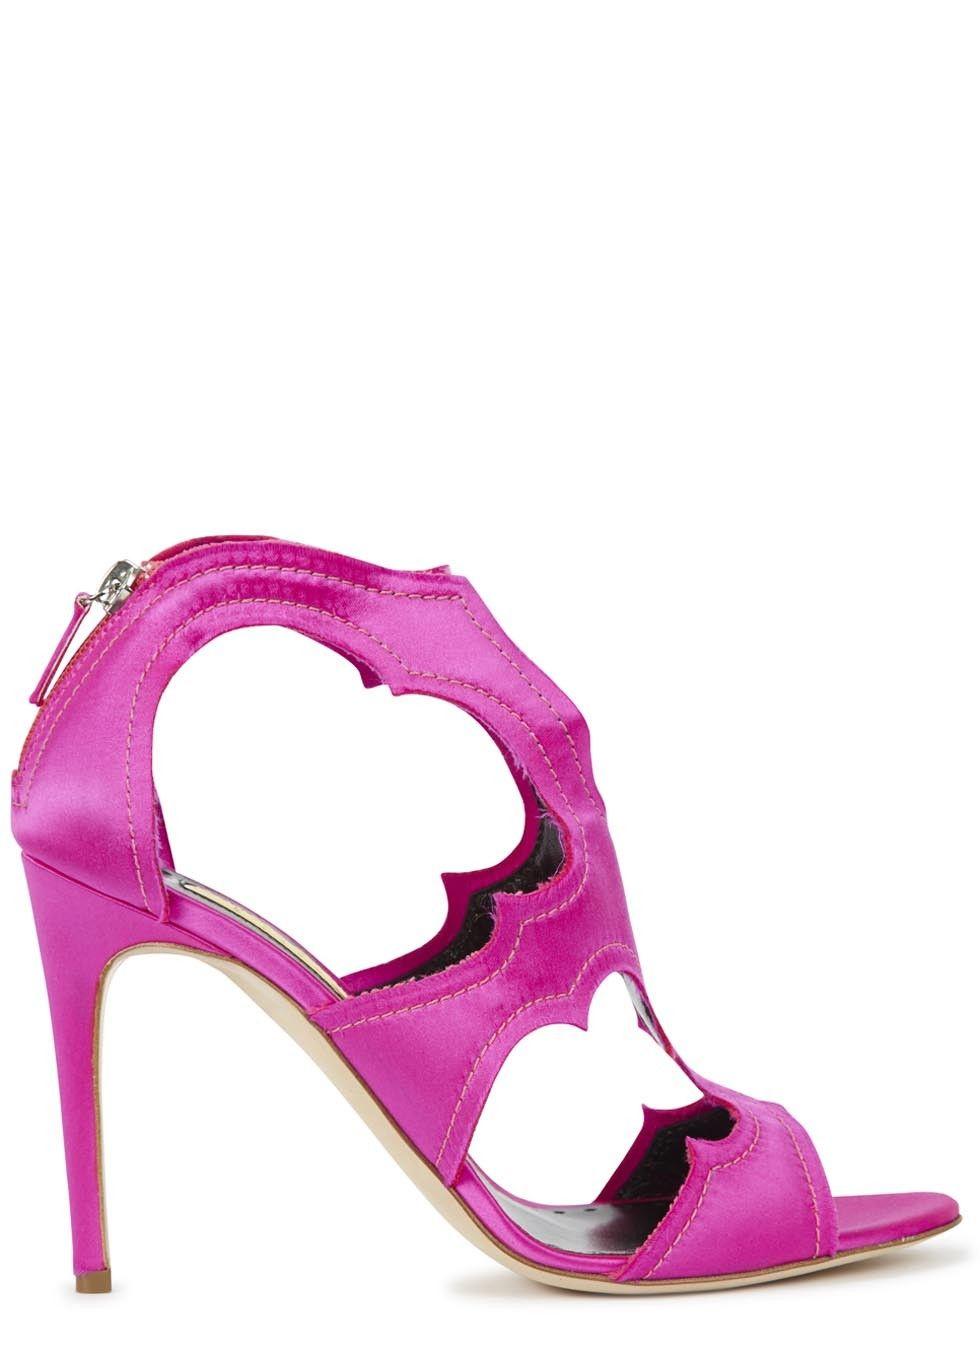 68ec1d9a45f0 Rupert Sanderson hot pink satin sandals http   www.harveynichols.com ...